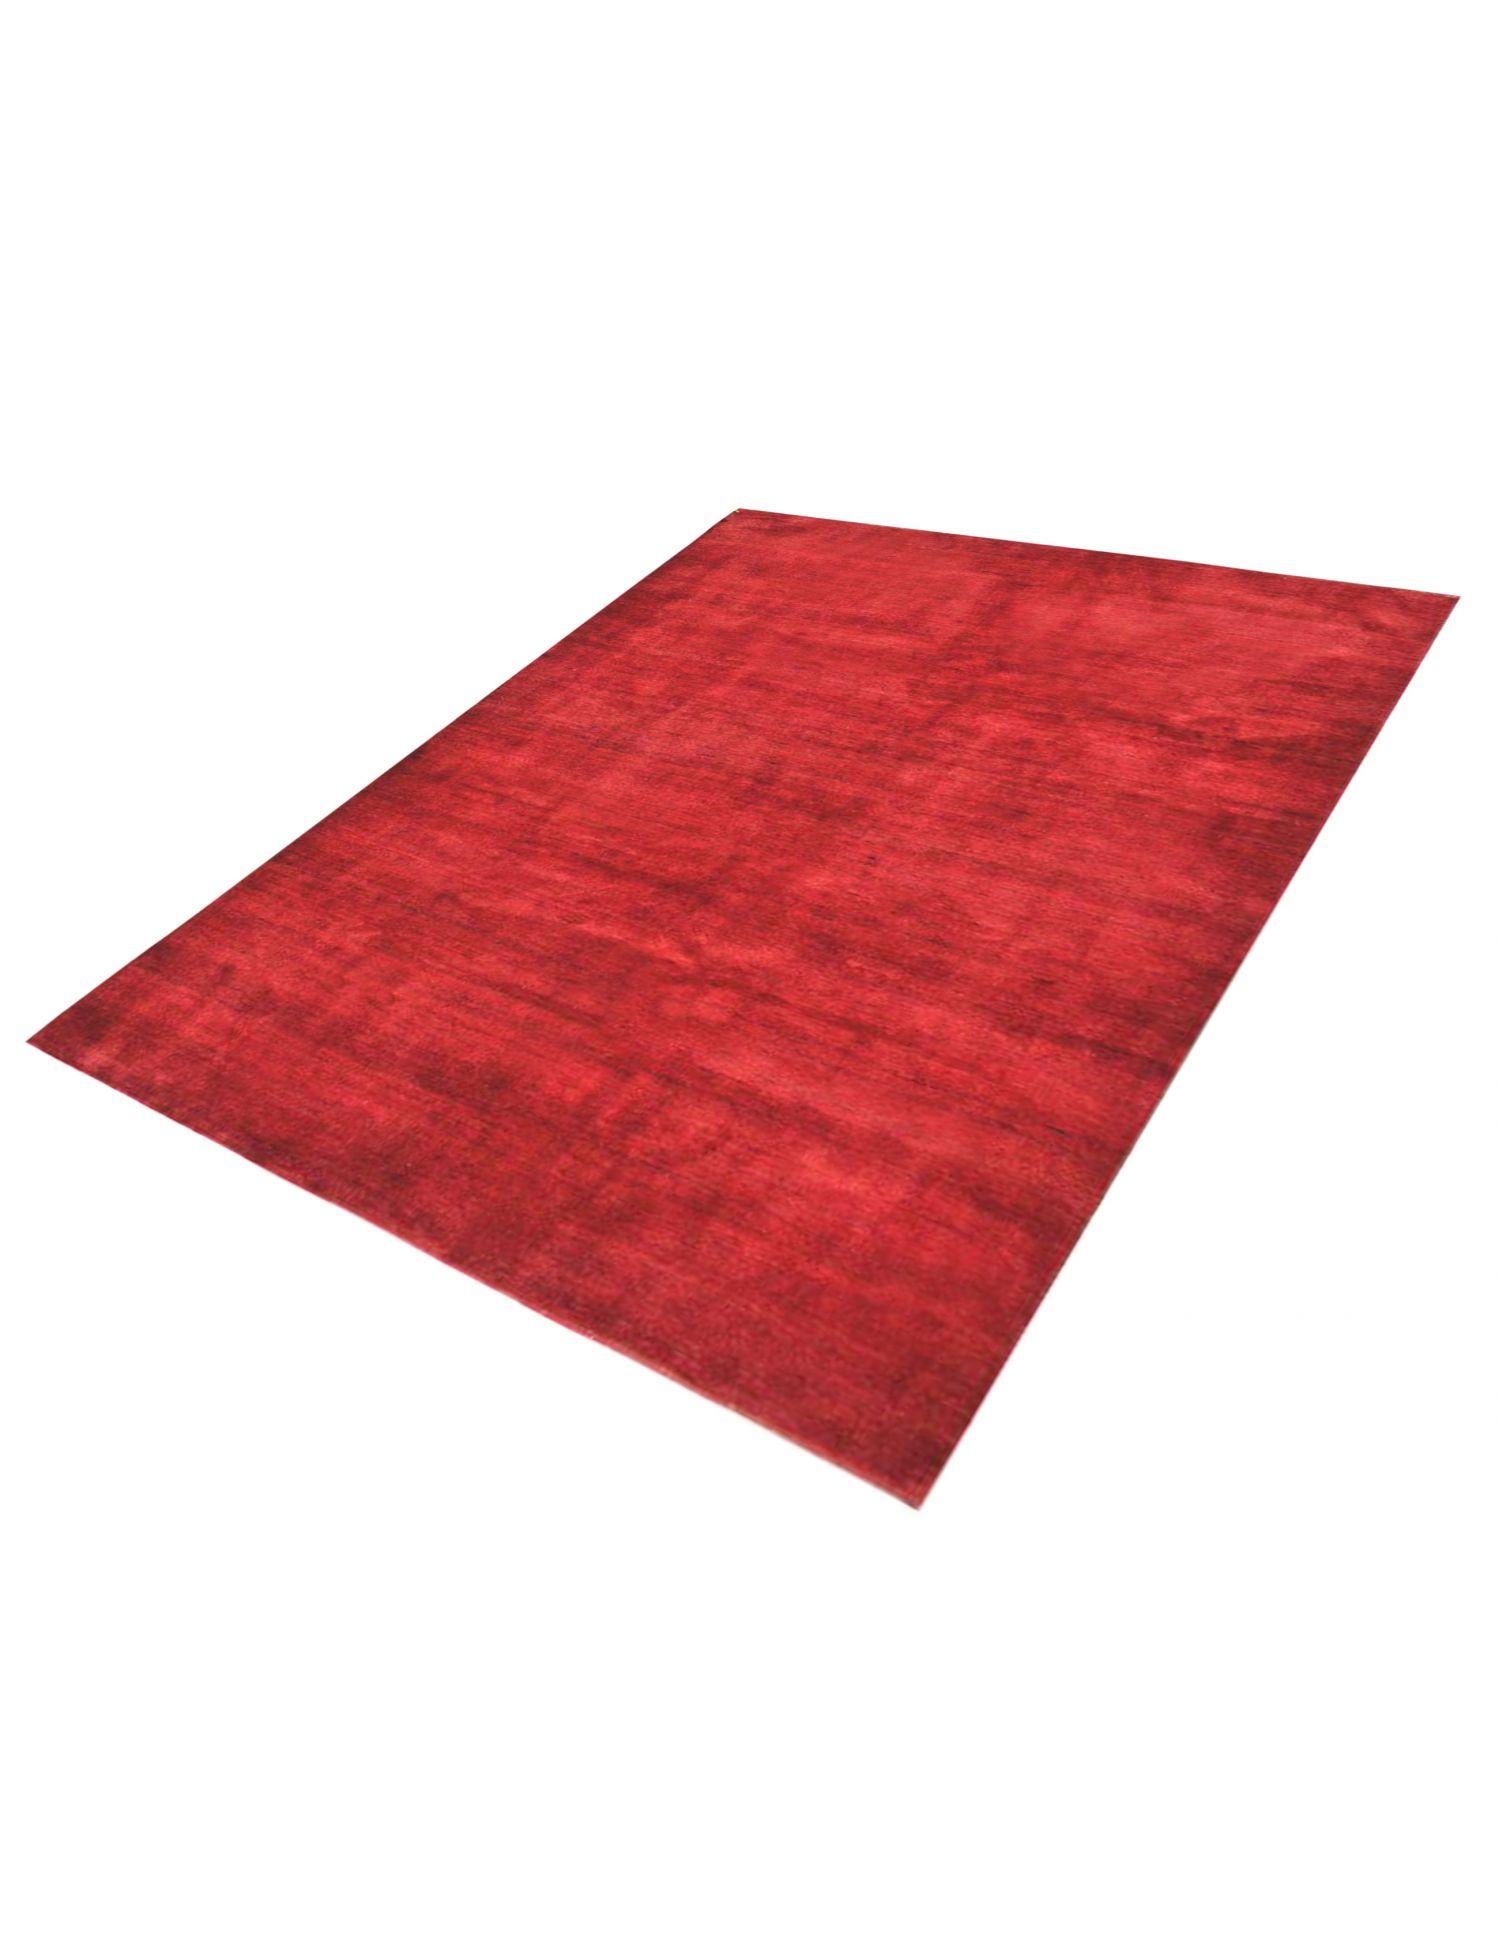 Moderne Teppiche  rot <br/>241 x 180 cm